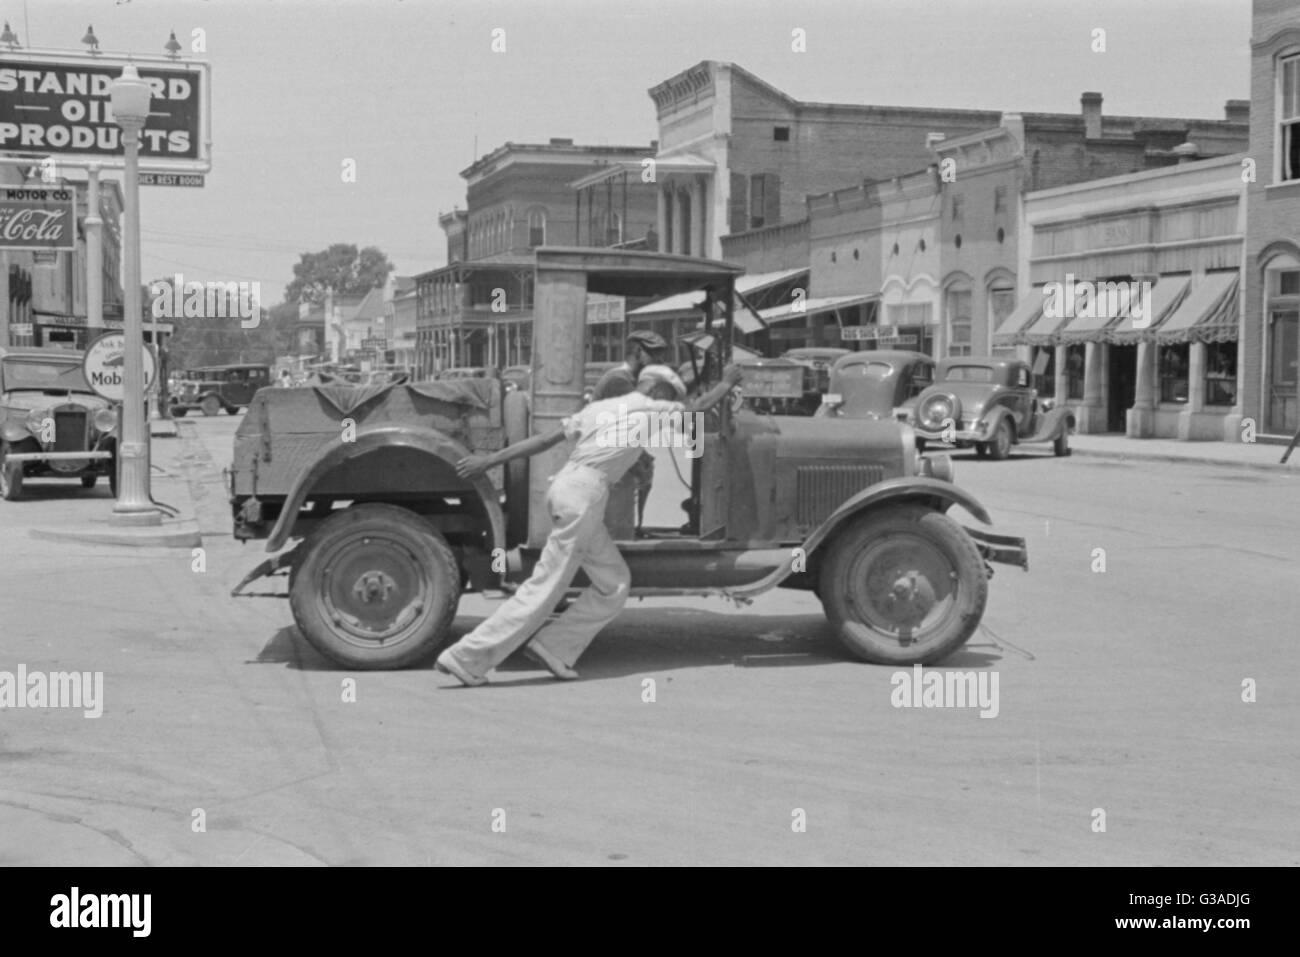 Old Banger Car Stock Photos & Old Banger Car Stock Images - Alamy